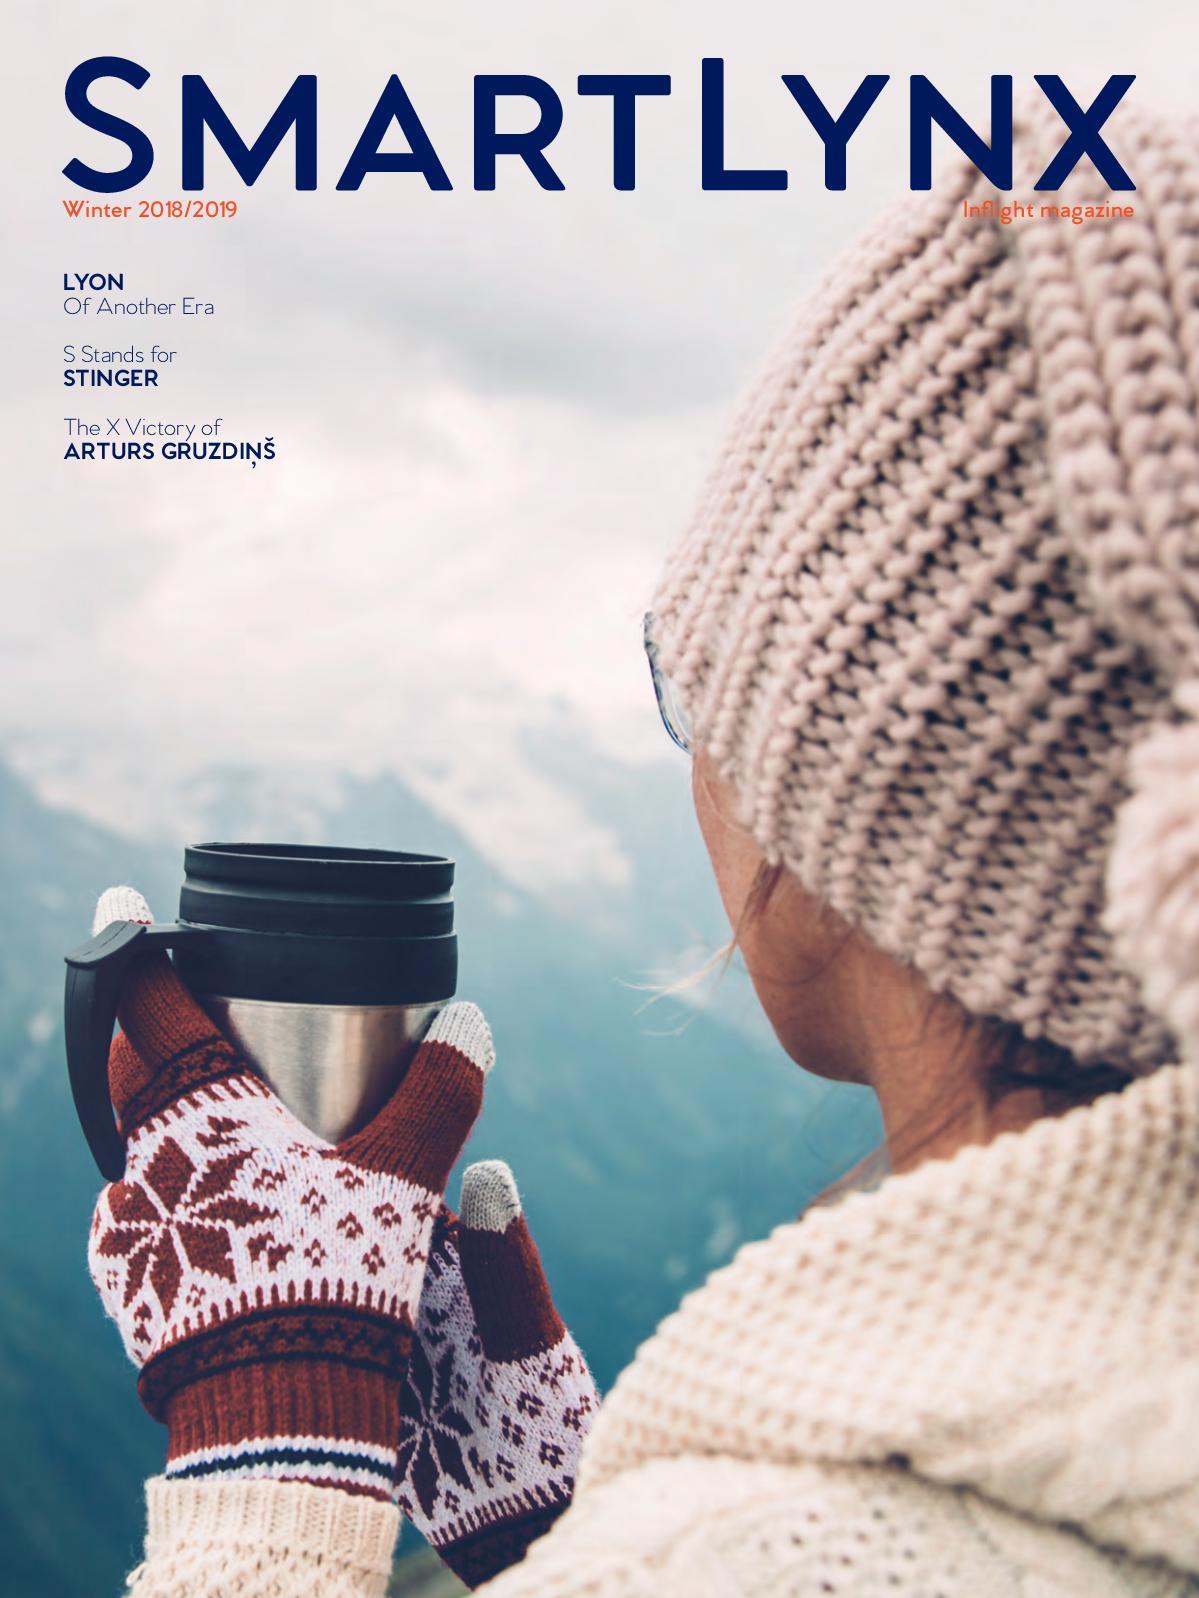 7413584855466a Calaméo - SmartLynx in-flight magazine Winter 2018/2019